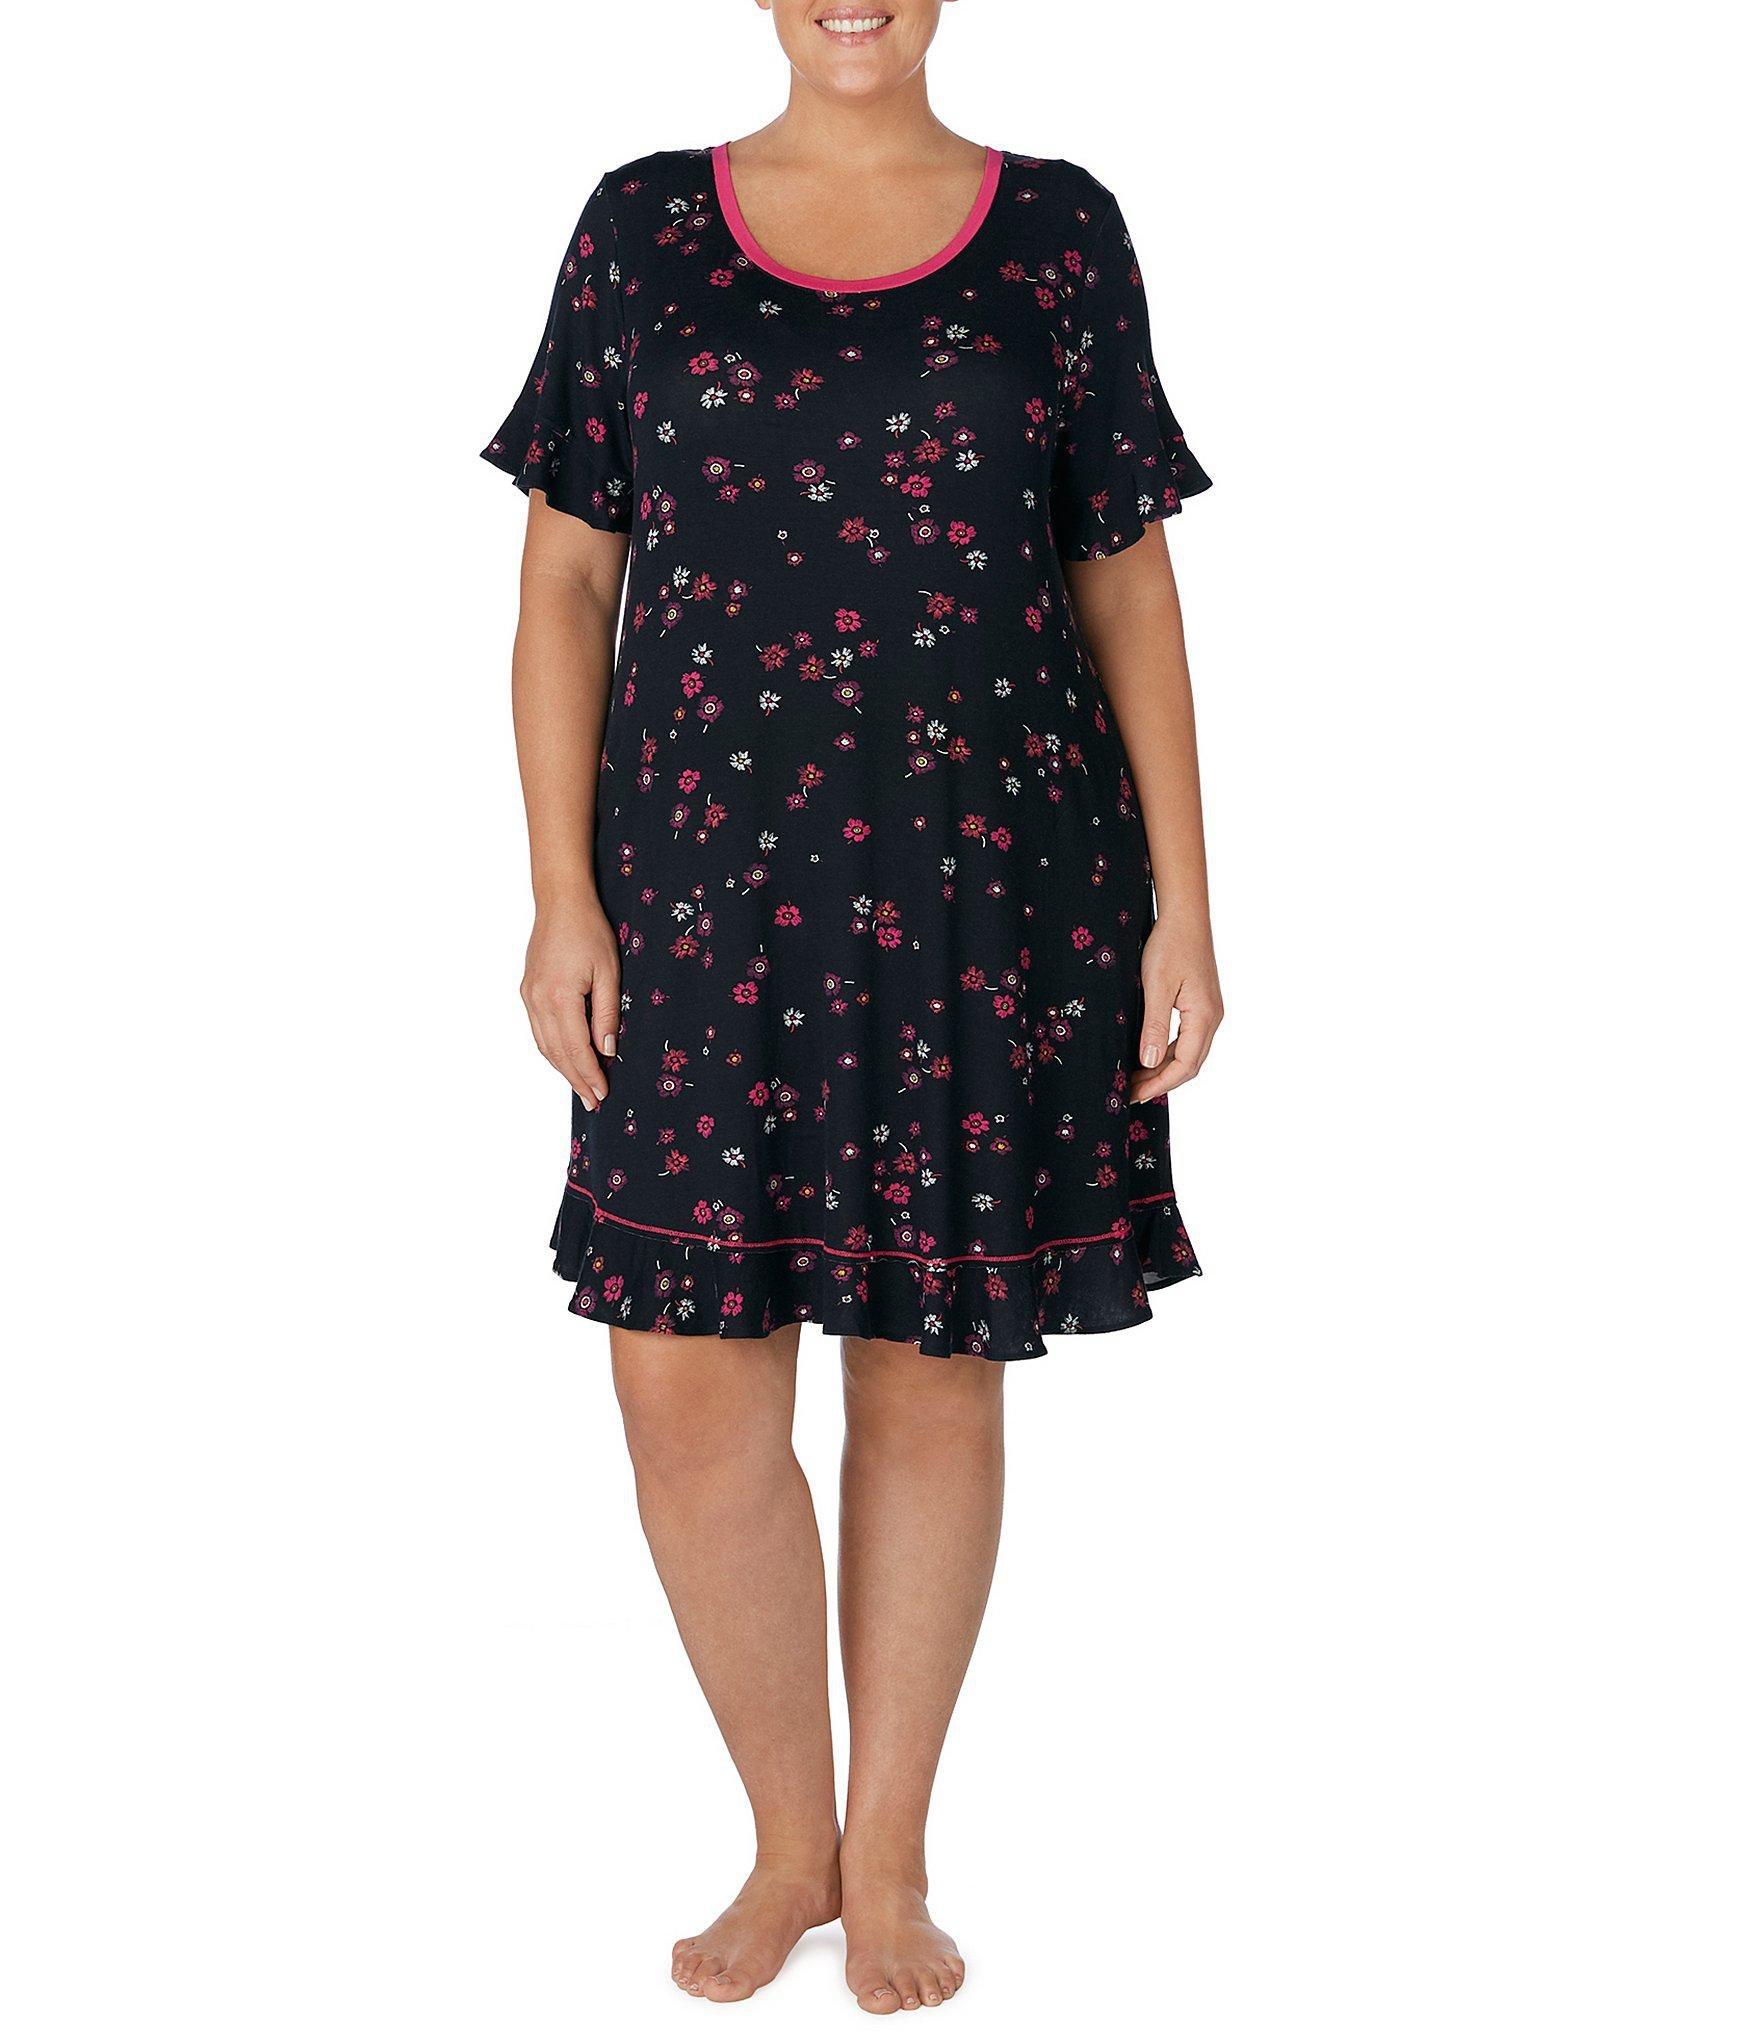 Kensie. Women s Black Plus Floral-printed Ruffle-trimmed Jersey Knit  Sleepshirt 14703ff3c